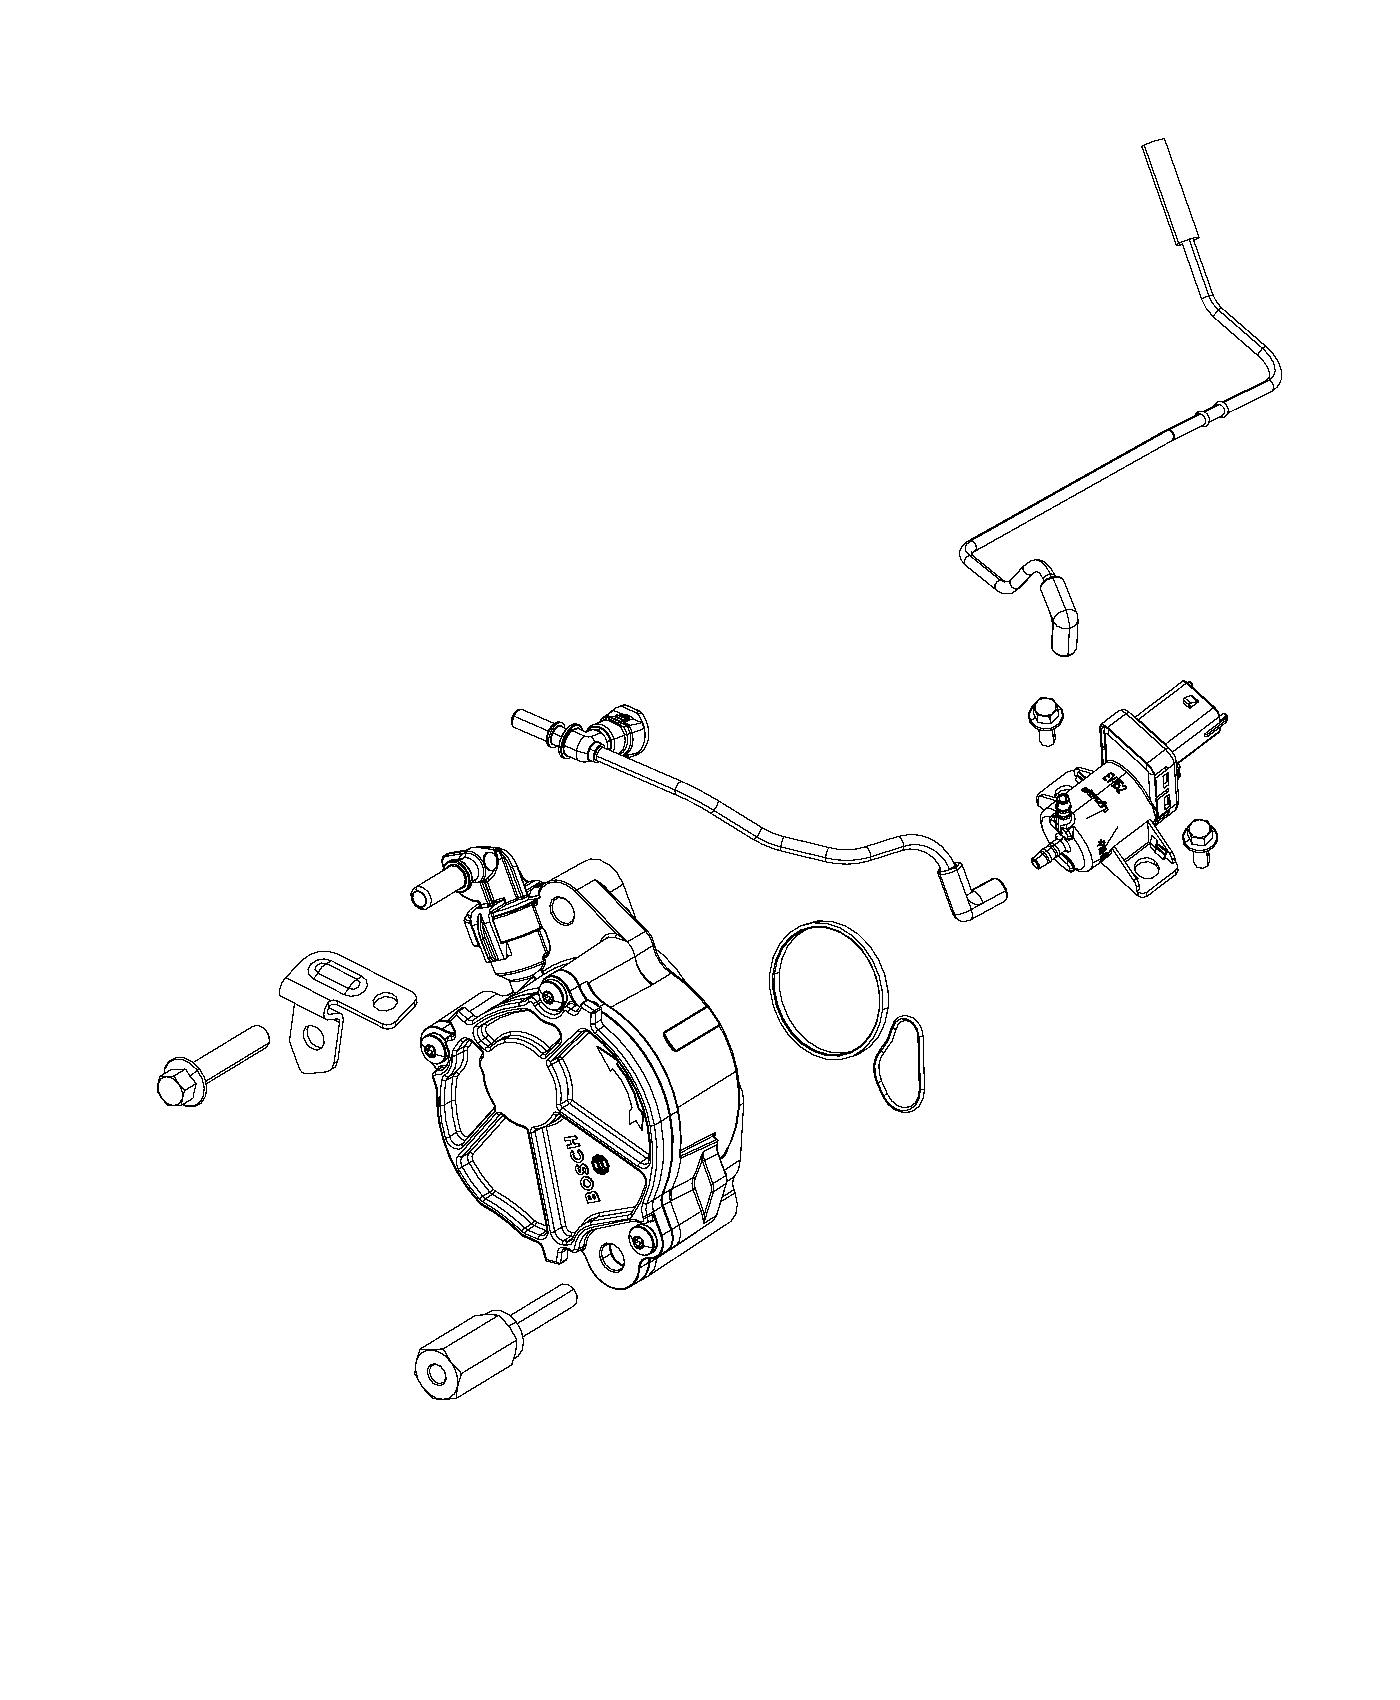 2014 Jeep Grand Cherokee Pump. Vacuum. Emissions, export